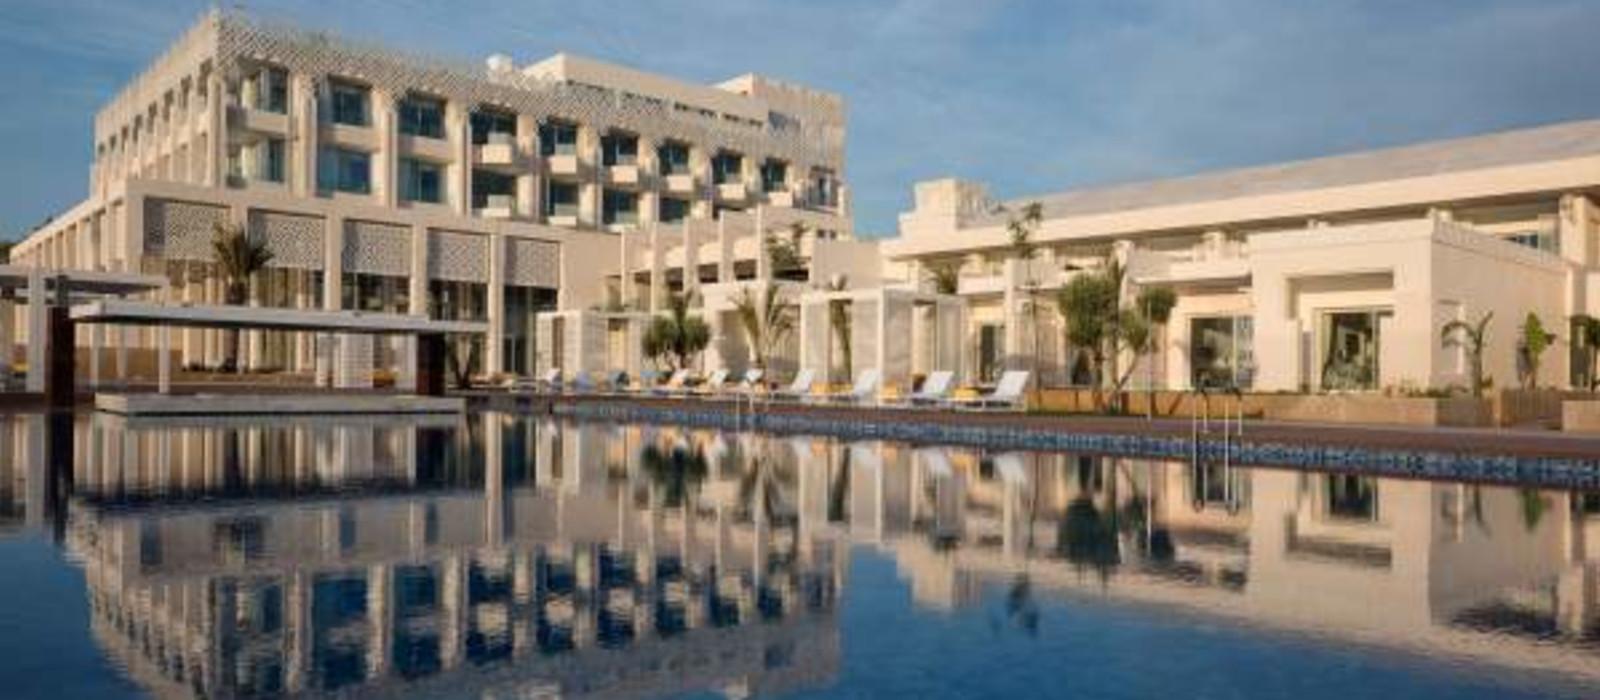 Hotel Marchica Lagoon Resort Morocco